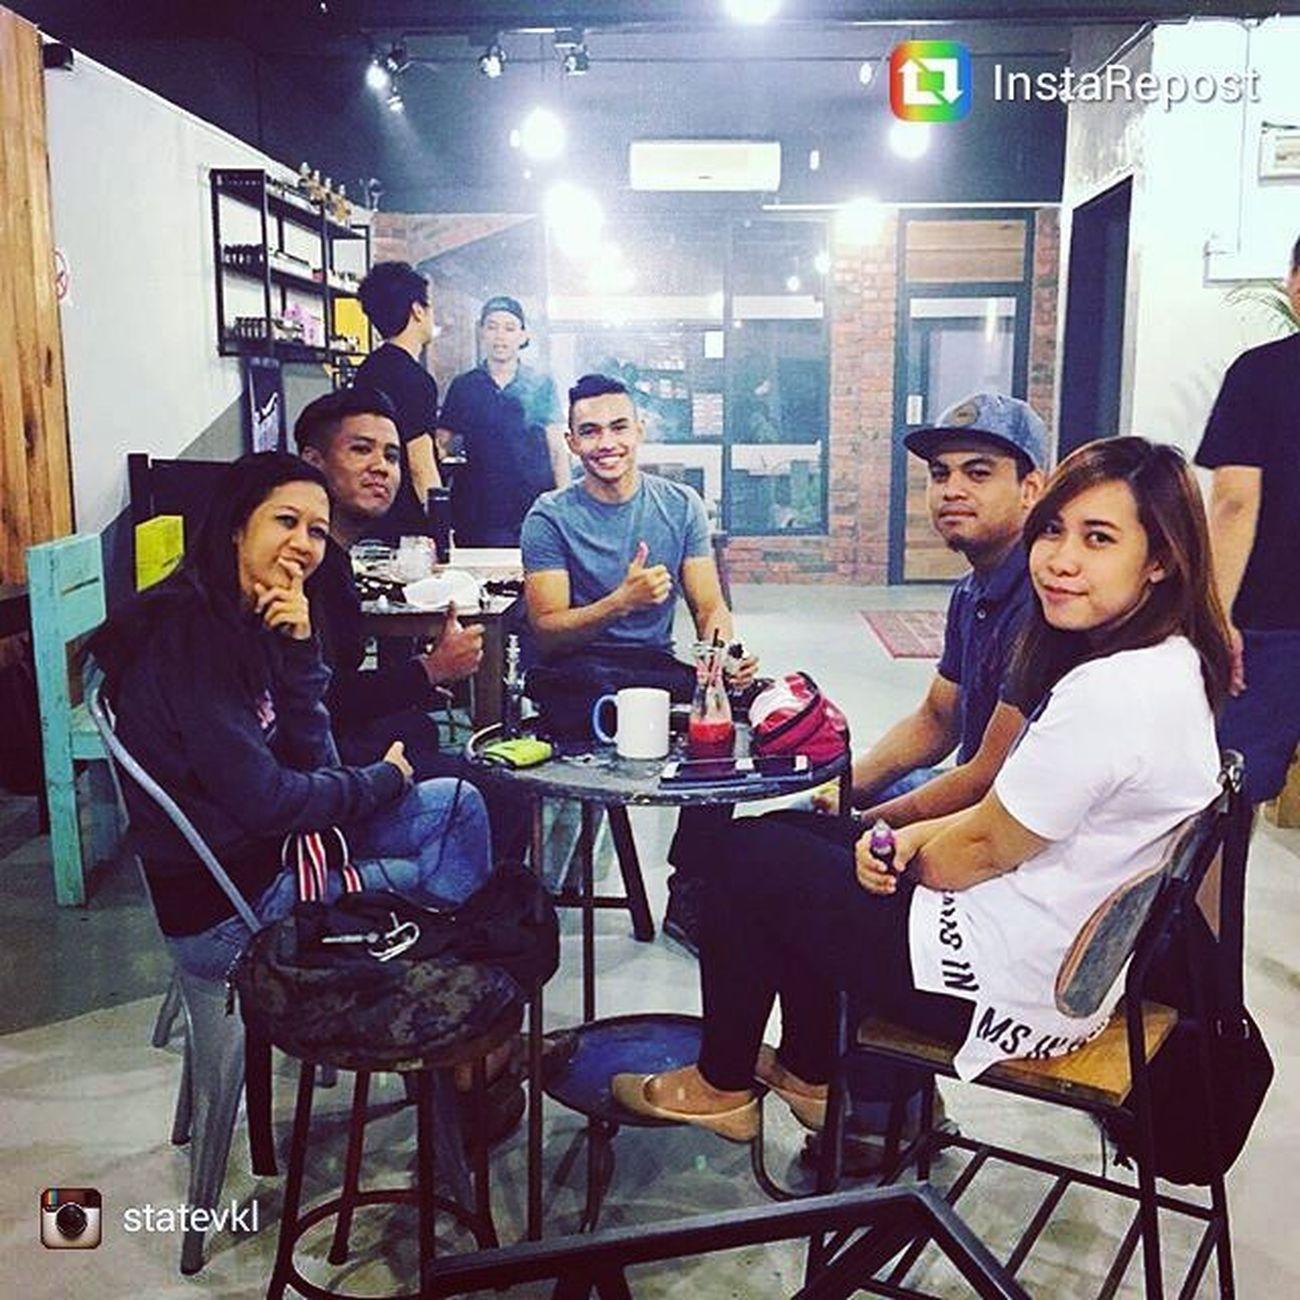 Find somewhere for Vape Cafe and chill out? Come here!! Come to @statevkl at : 🏬StateV Club Lounge No.135A, 1st Floor, Jalan Aminuddin Baki, 60000 TTDi, KL. 🔋Business Hours : 1pm - 12am daily EXCEPT Friday & Weekends : 1pm - 3am ◾◾◾◾ Vape Vaping ModCheck Vape vapefam dripclub cloudporn vapeporn vapegirls subohm vapeaddicts vapelife vapelyfe vapeon vapecommunity vapelove vapefamous ejuice mechmods vapestars vapehooligans vapegiveaway vapedaily vapestagram vapefriends guyswhovape juicecheck rumblejuice